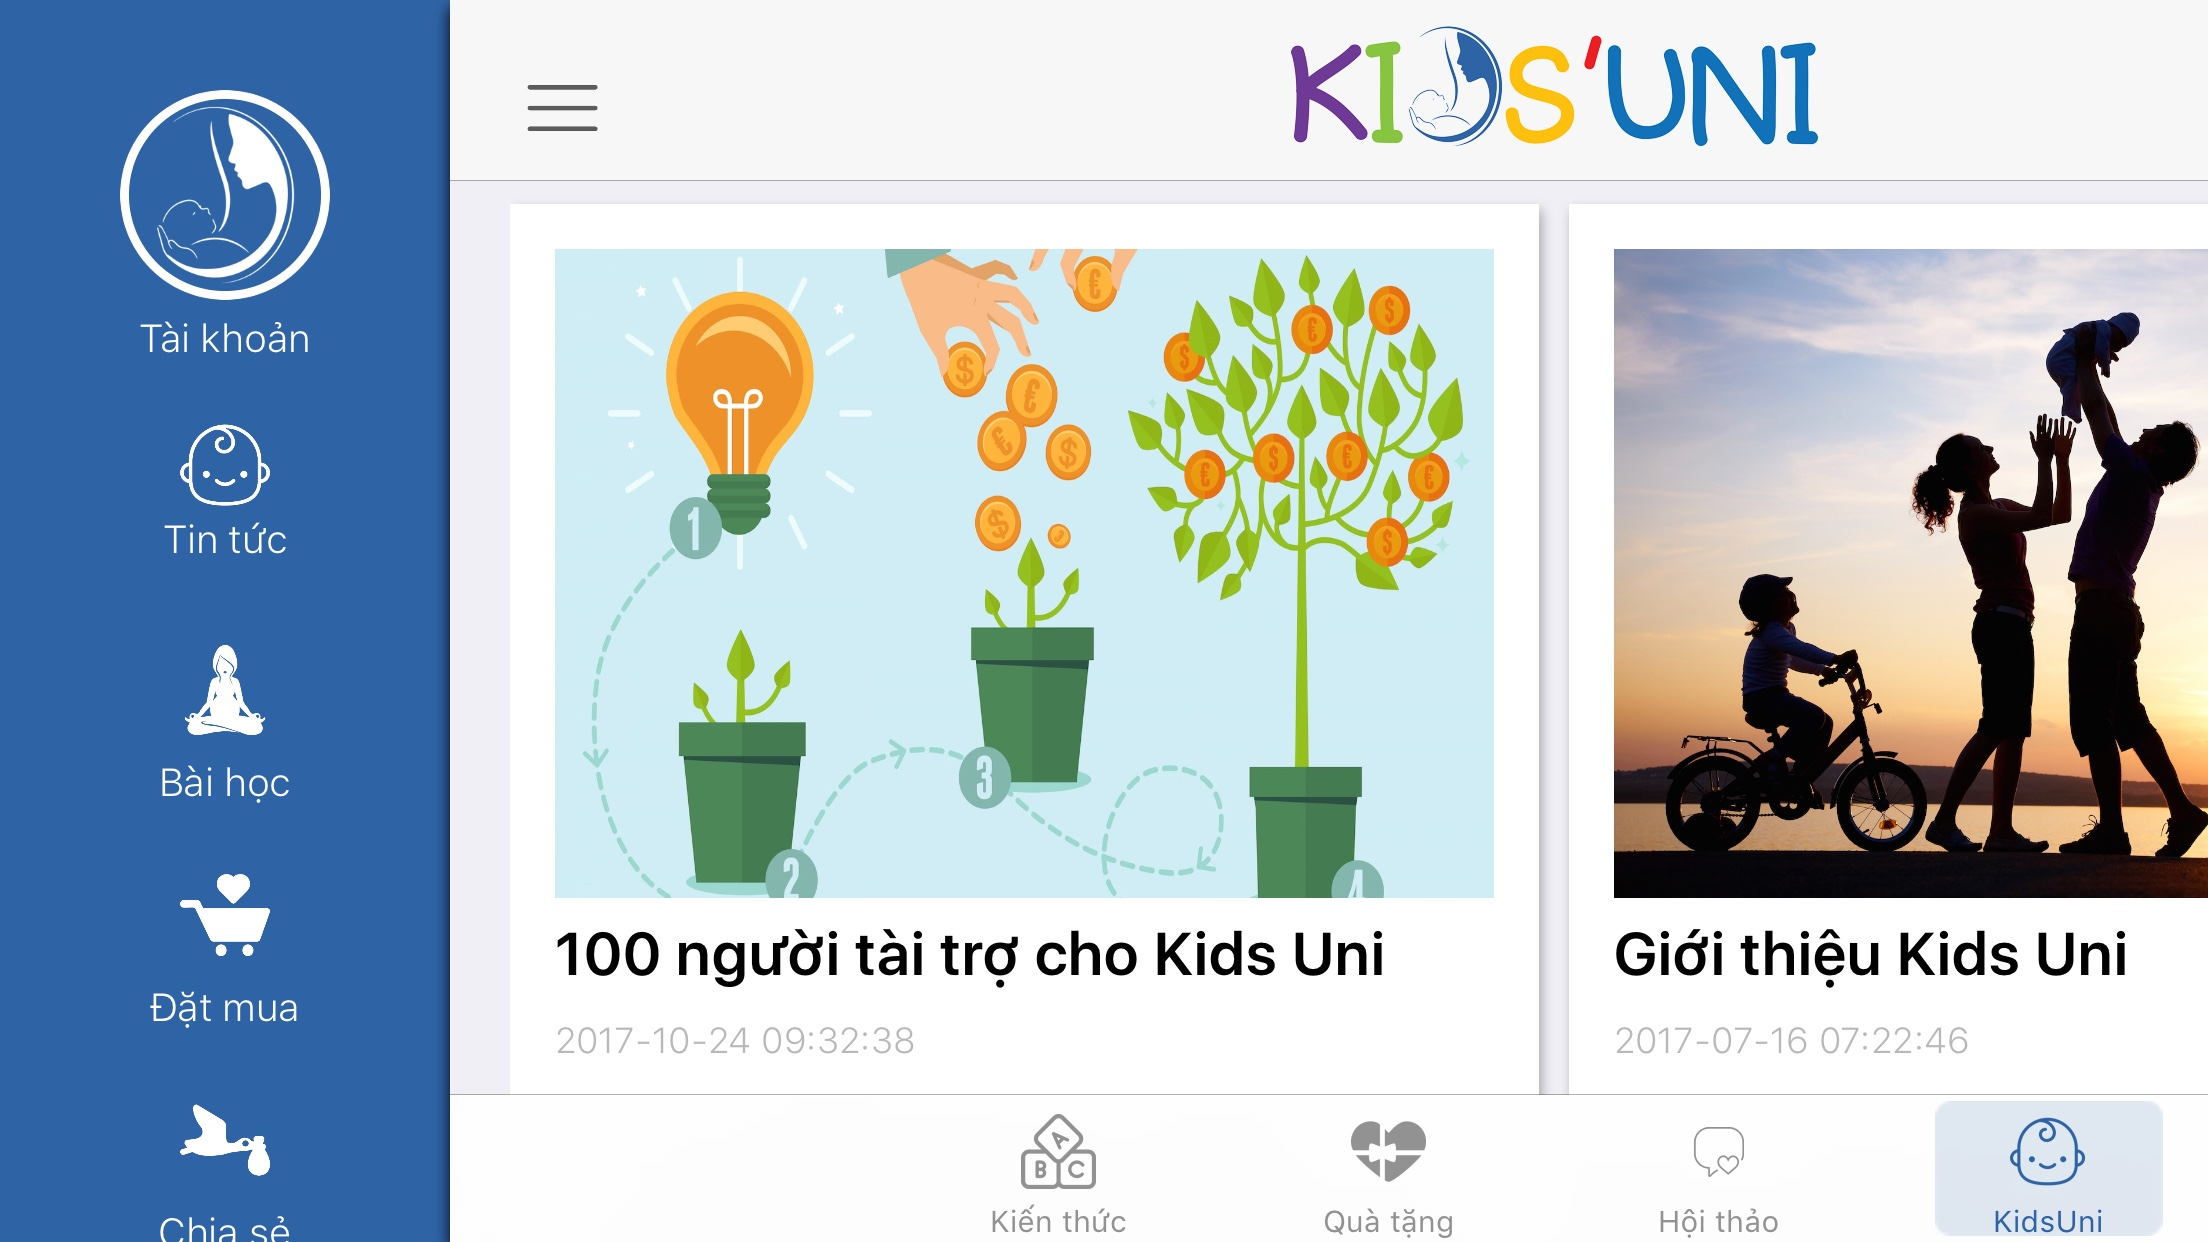 Ứng dụng KidsUni trên martphone